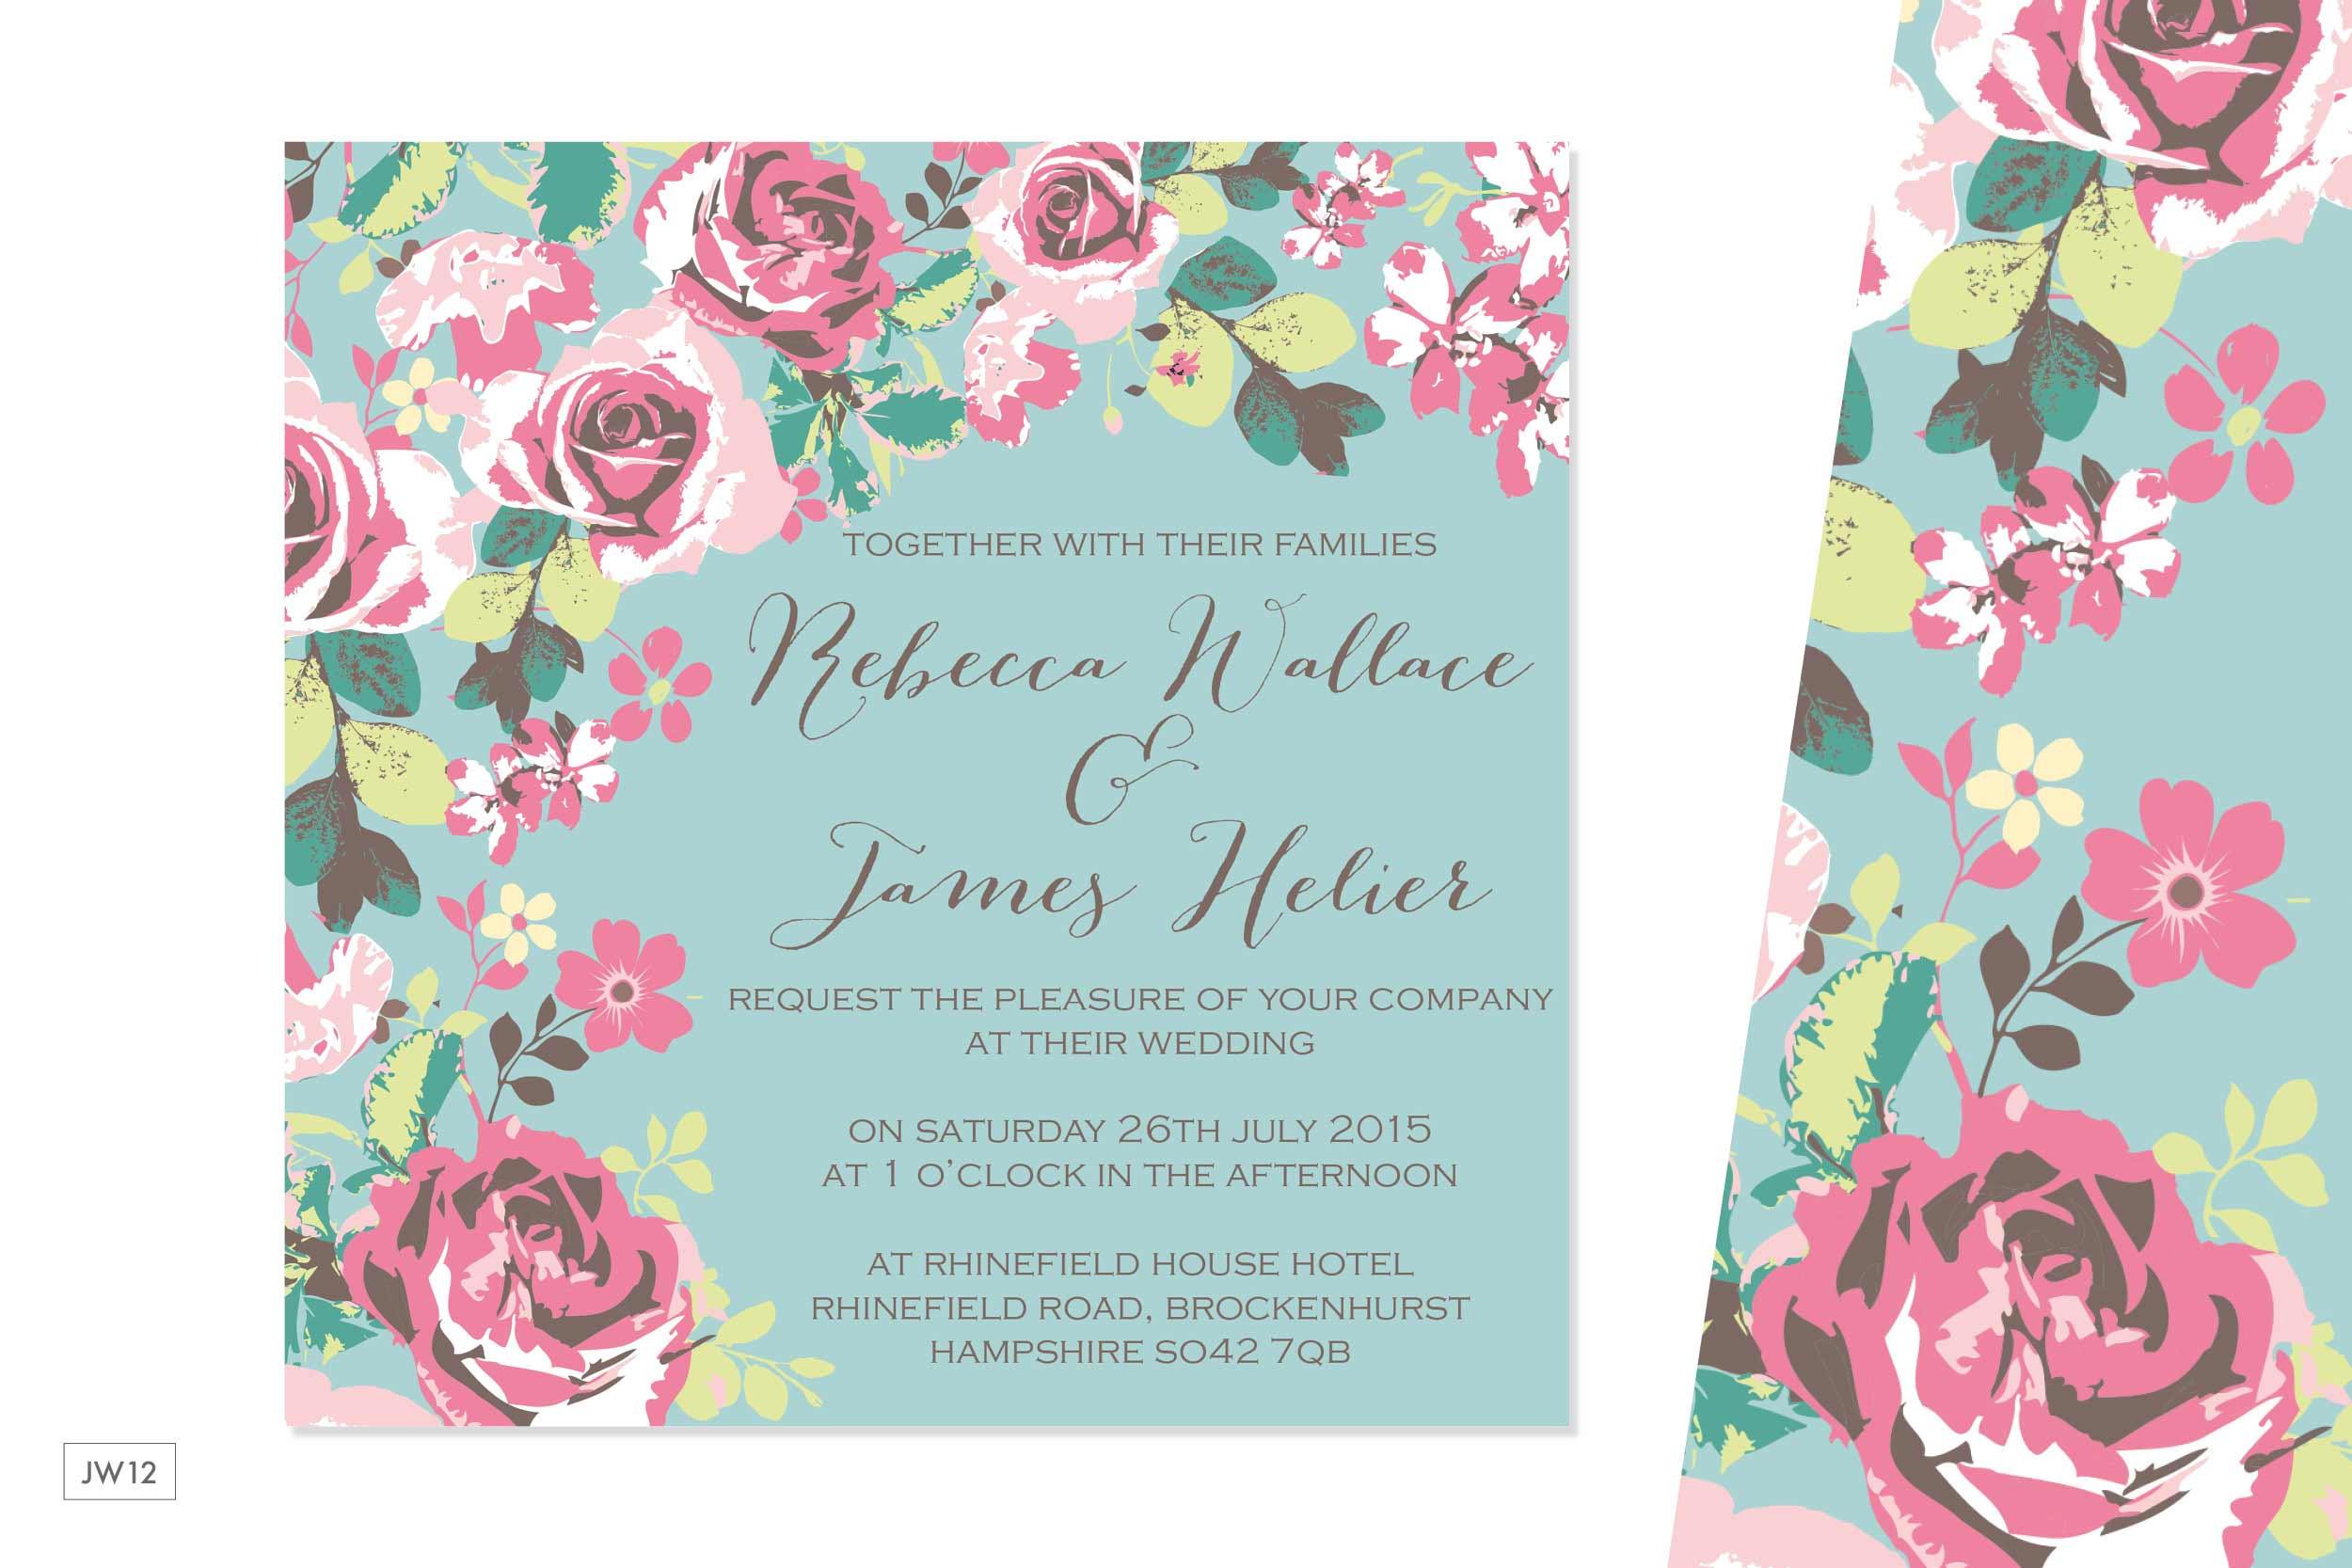 floral-pink-rose_wedding-invitation_ananyacards.com-01.jpg